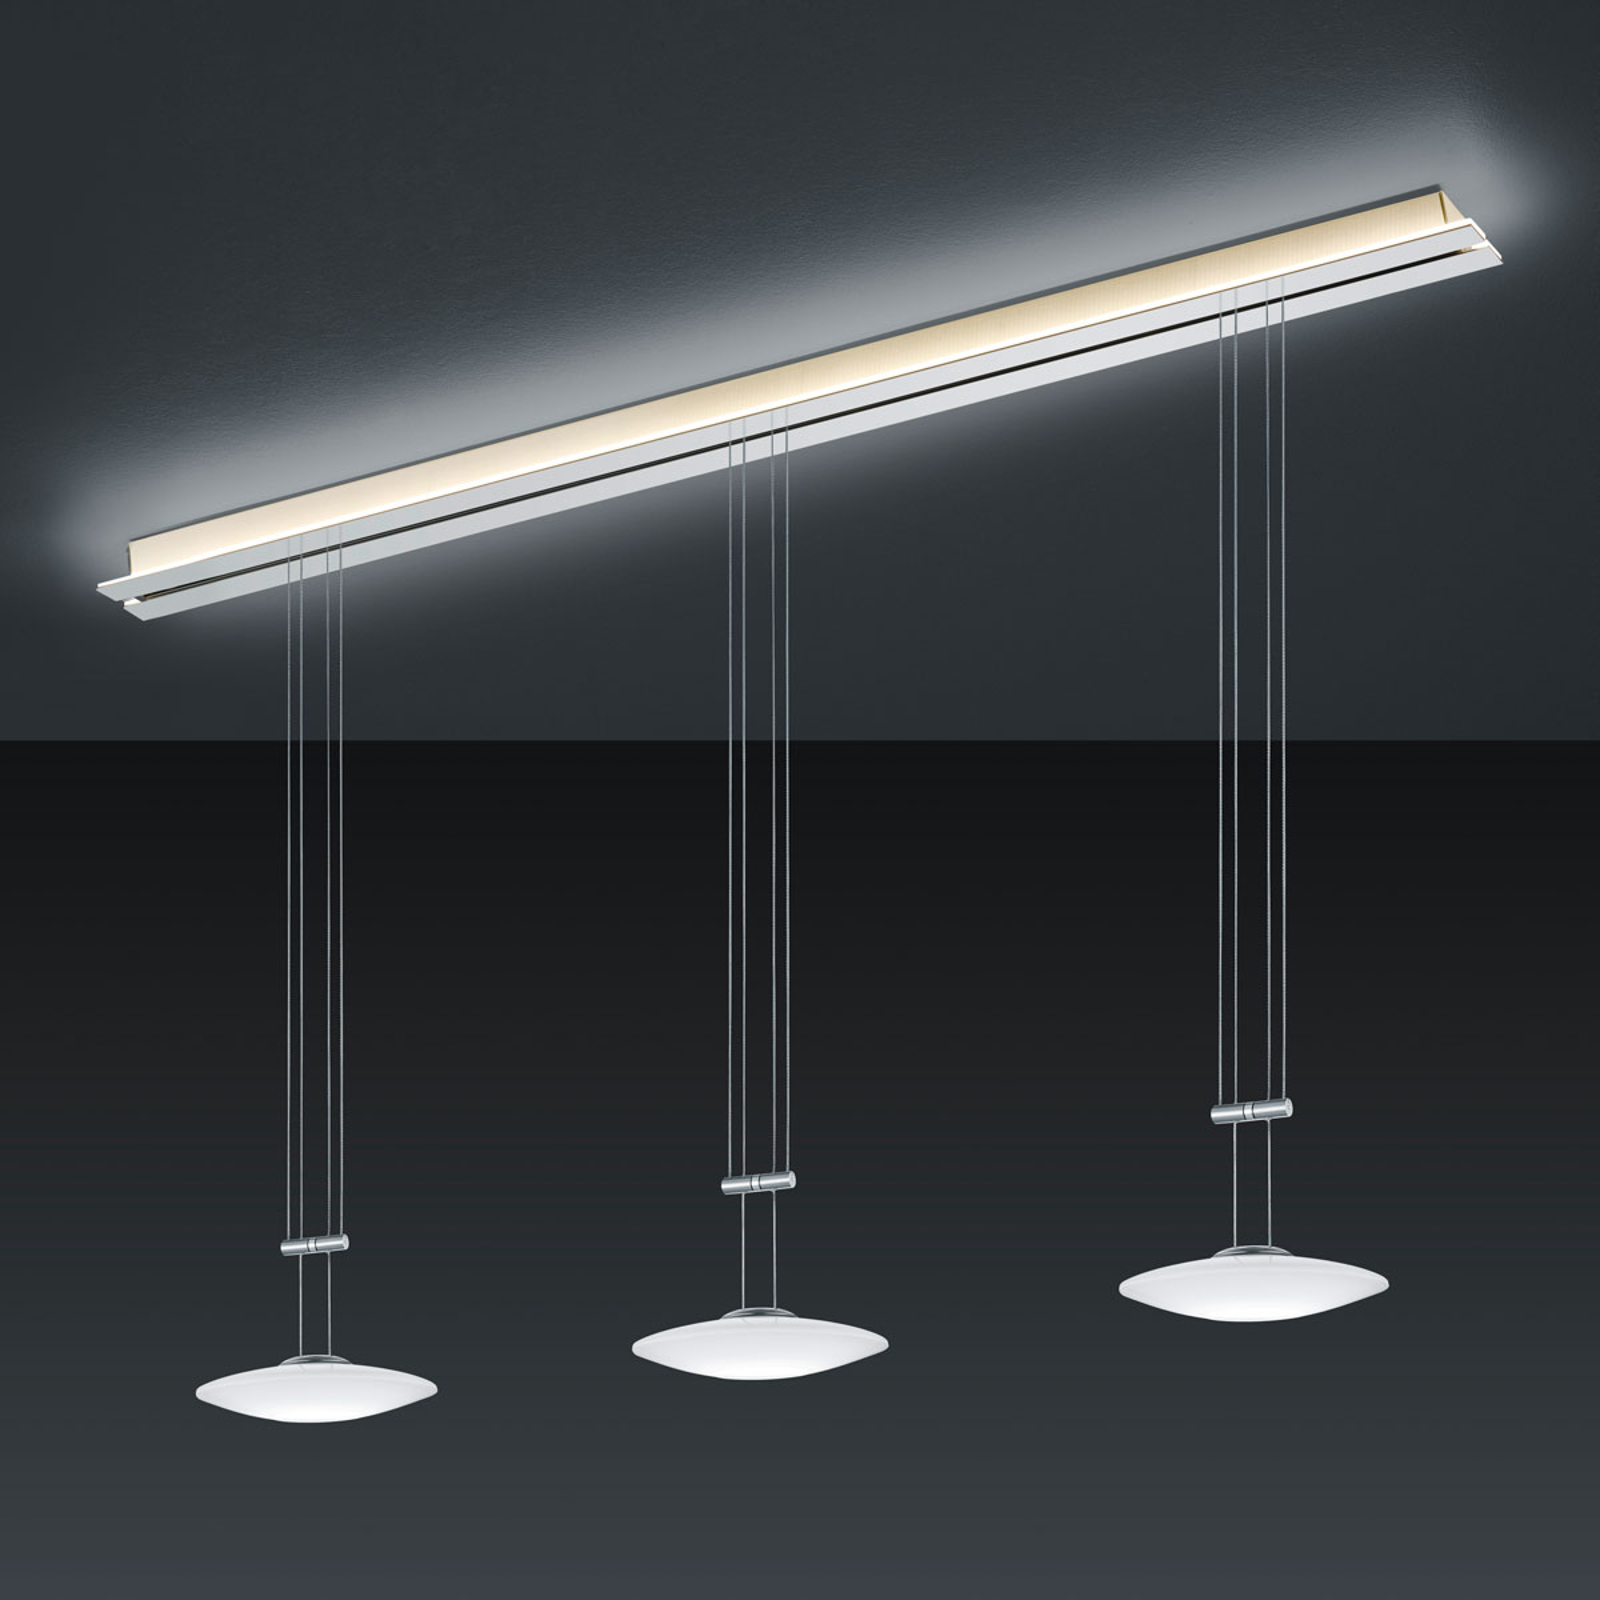 BANKAMP Strada Orbit lampa wisząca, 3-pkt., 155 cm